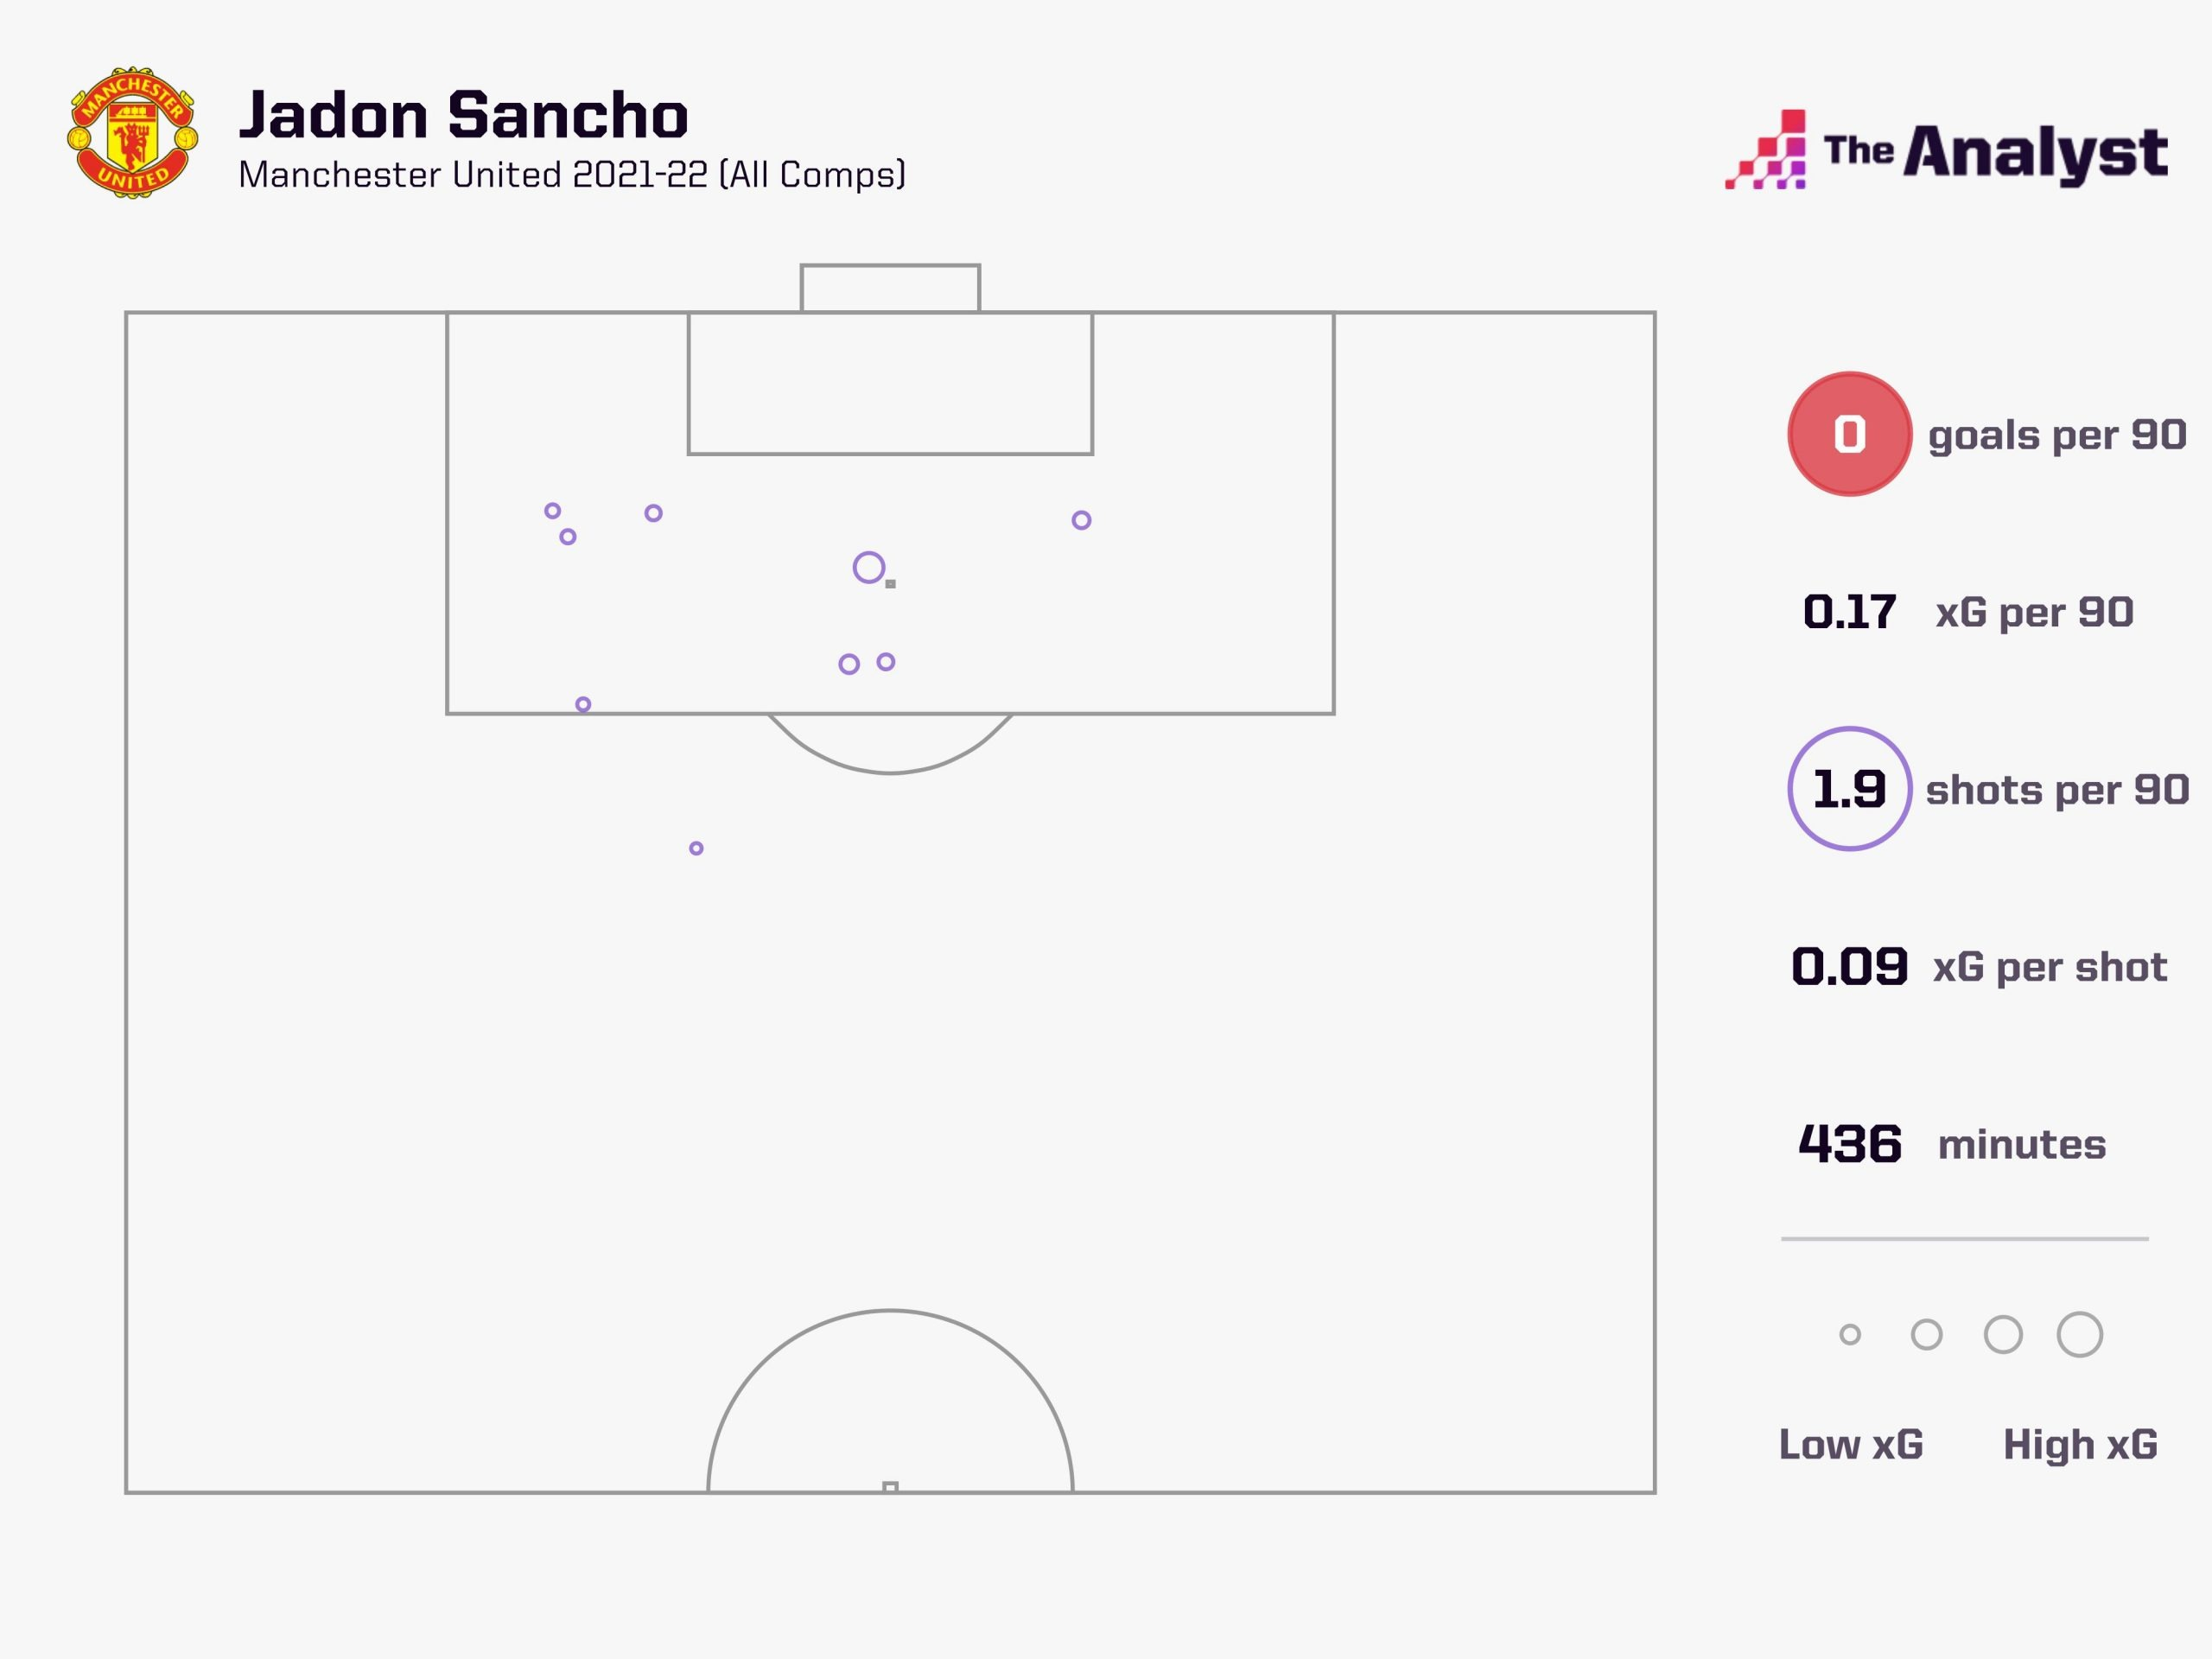 Jadon Sancho Man Utd shots